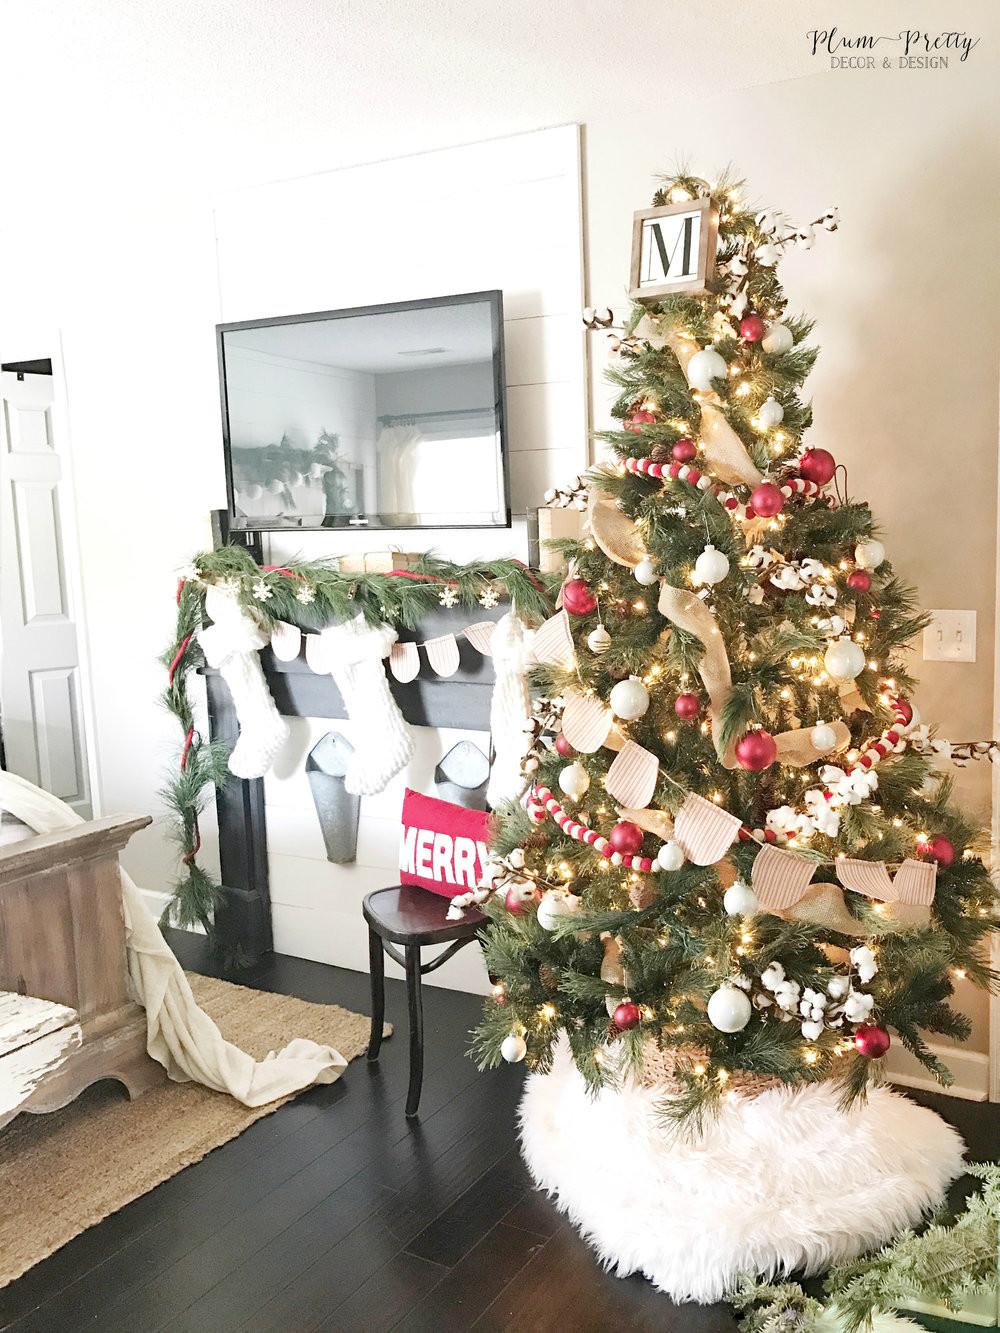 Bedroom Christmas Tree  Plum Pretty Decor & Design Co A Farmhouse Christmas Bedroom